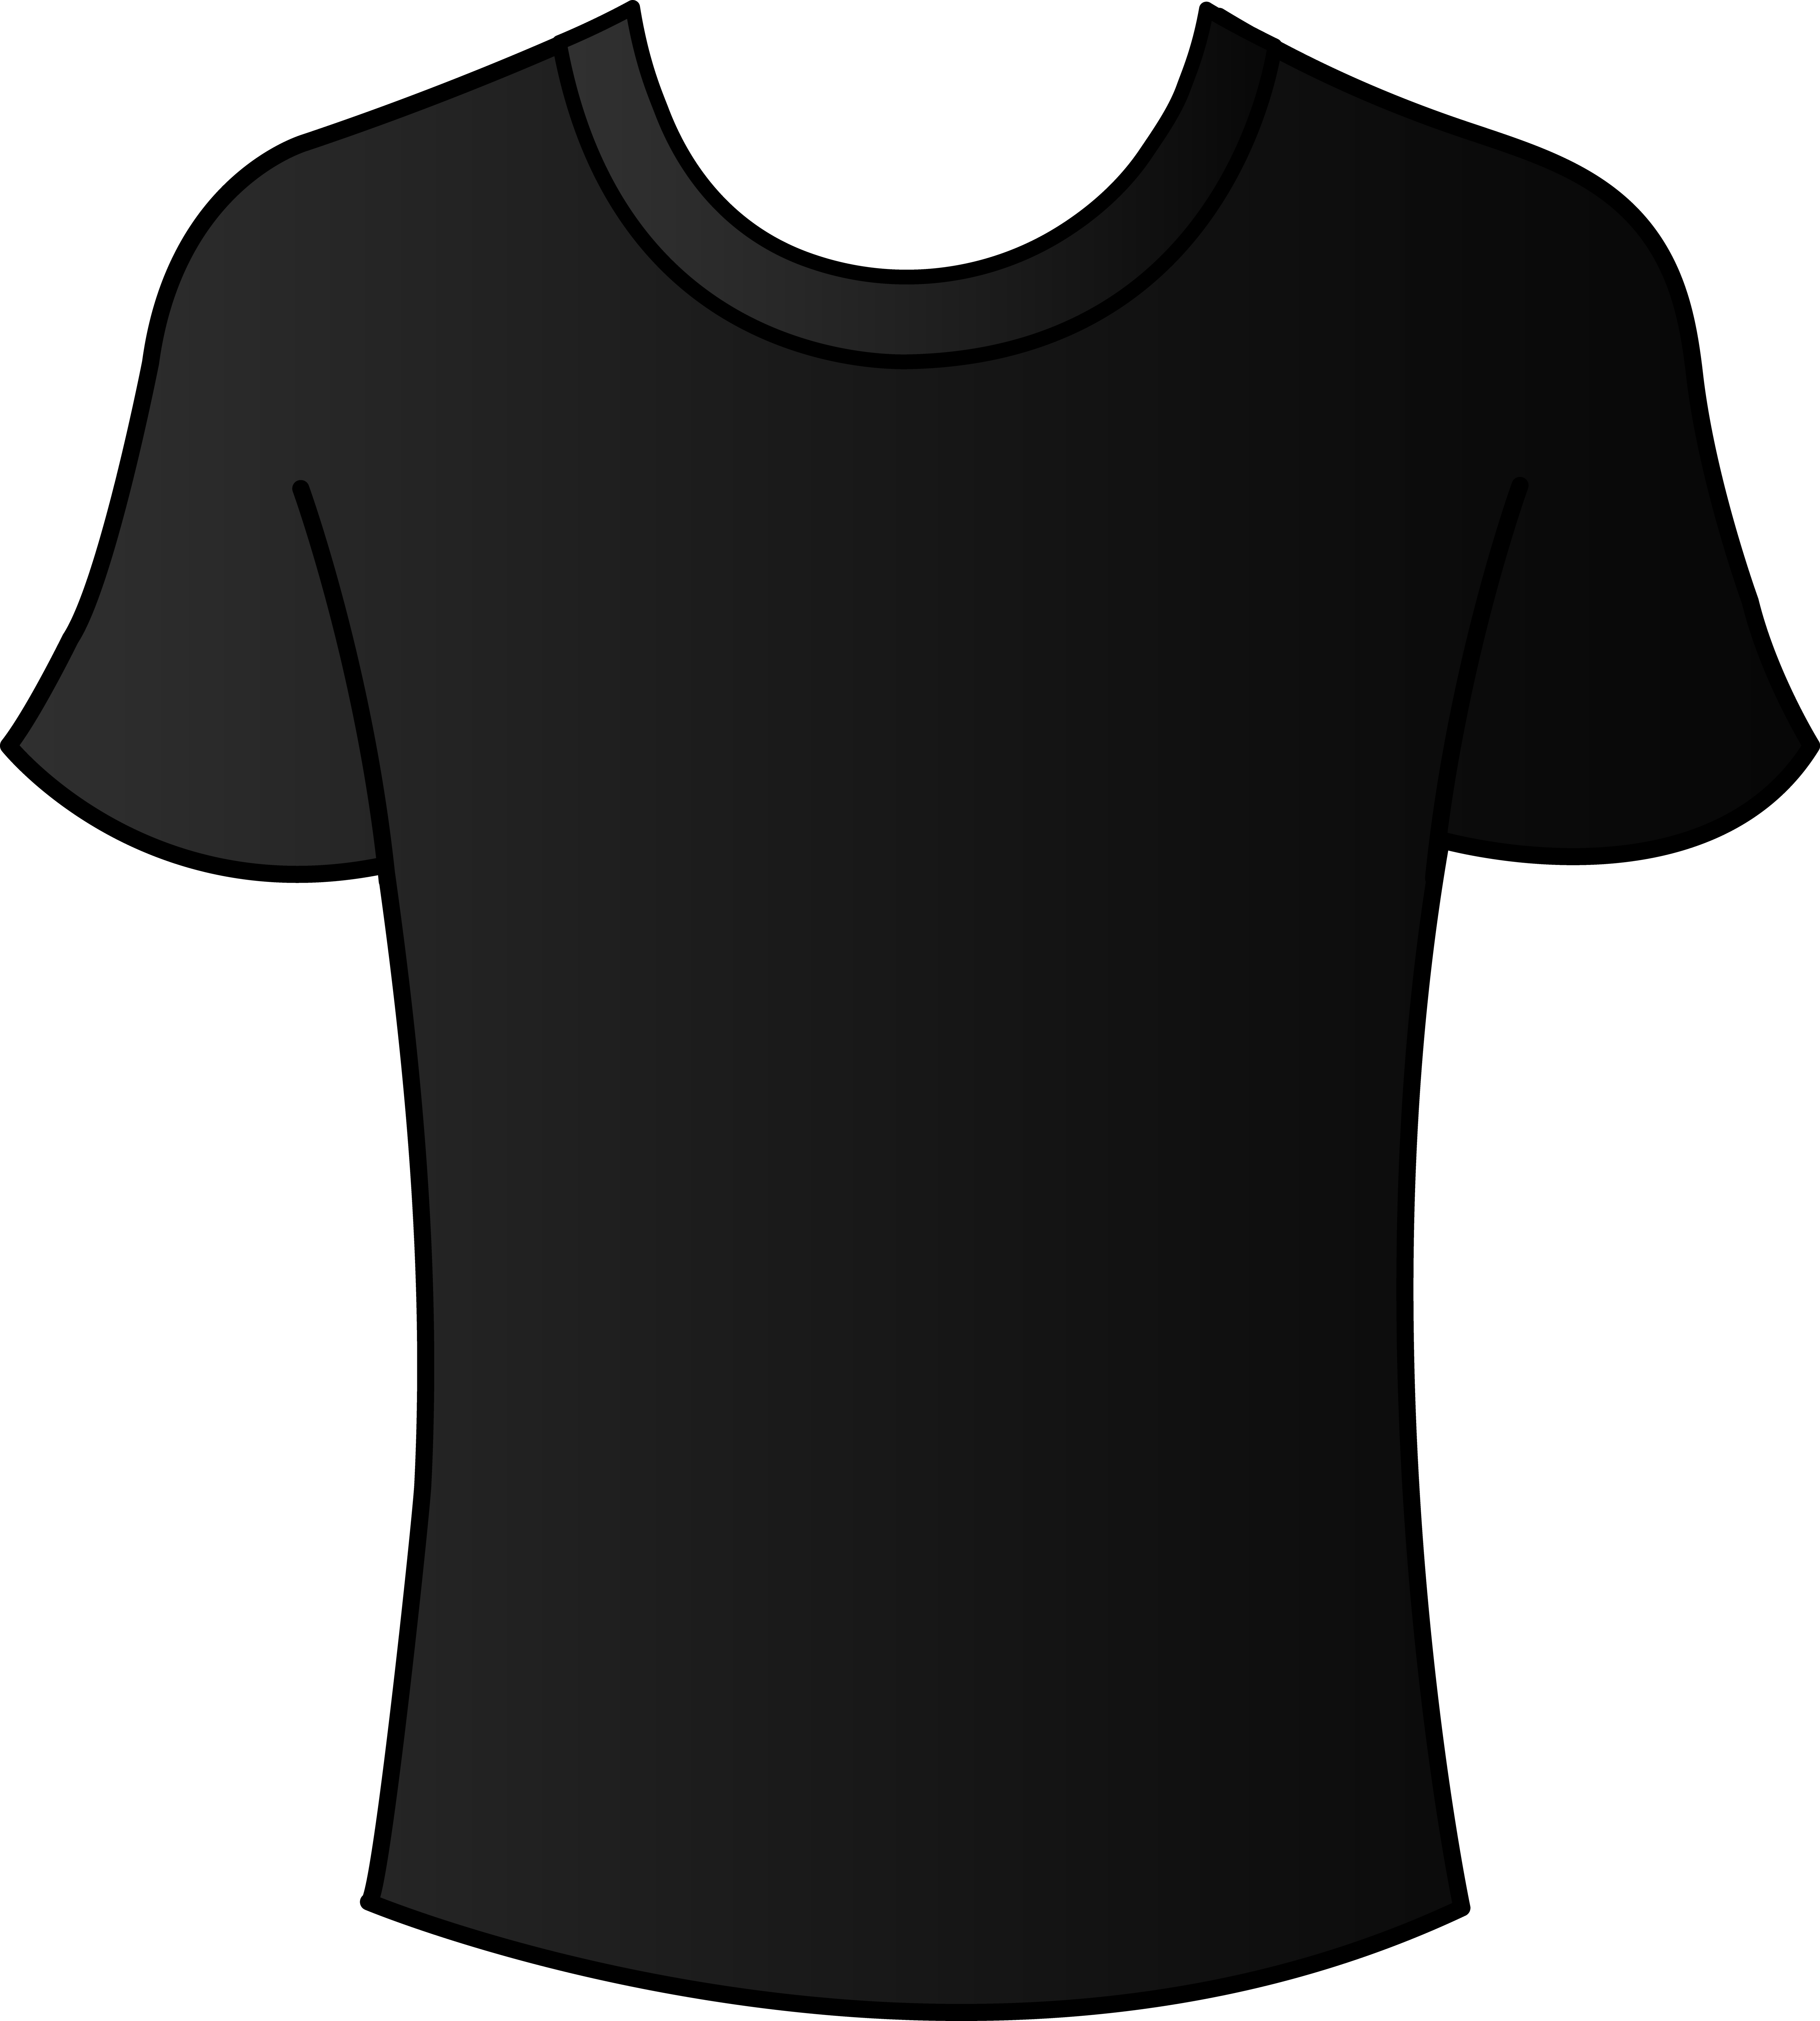 Front Back T Shirt Template Clipart Best